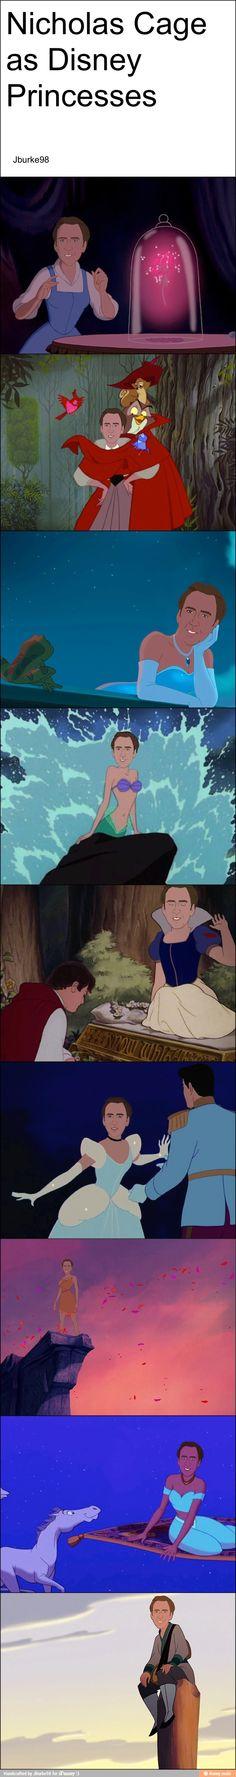 Nick cage Disney princesses / iFunny :)